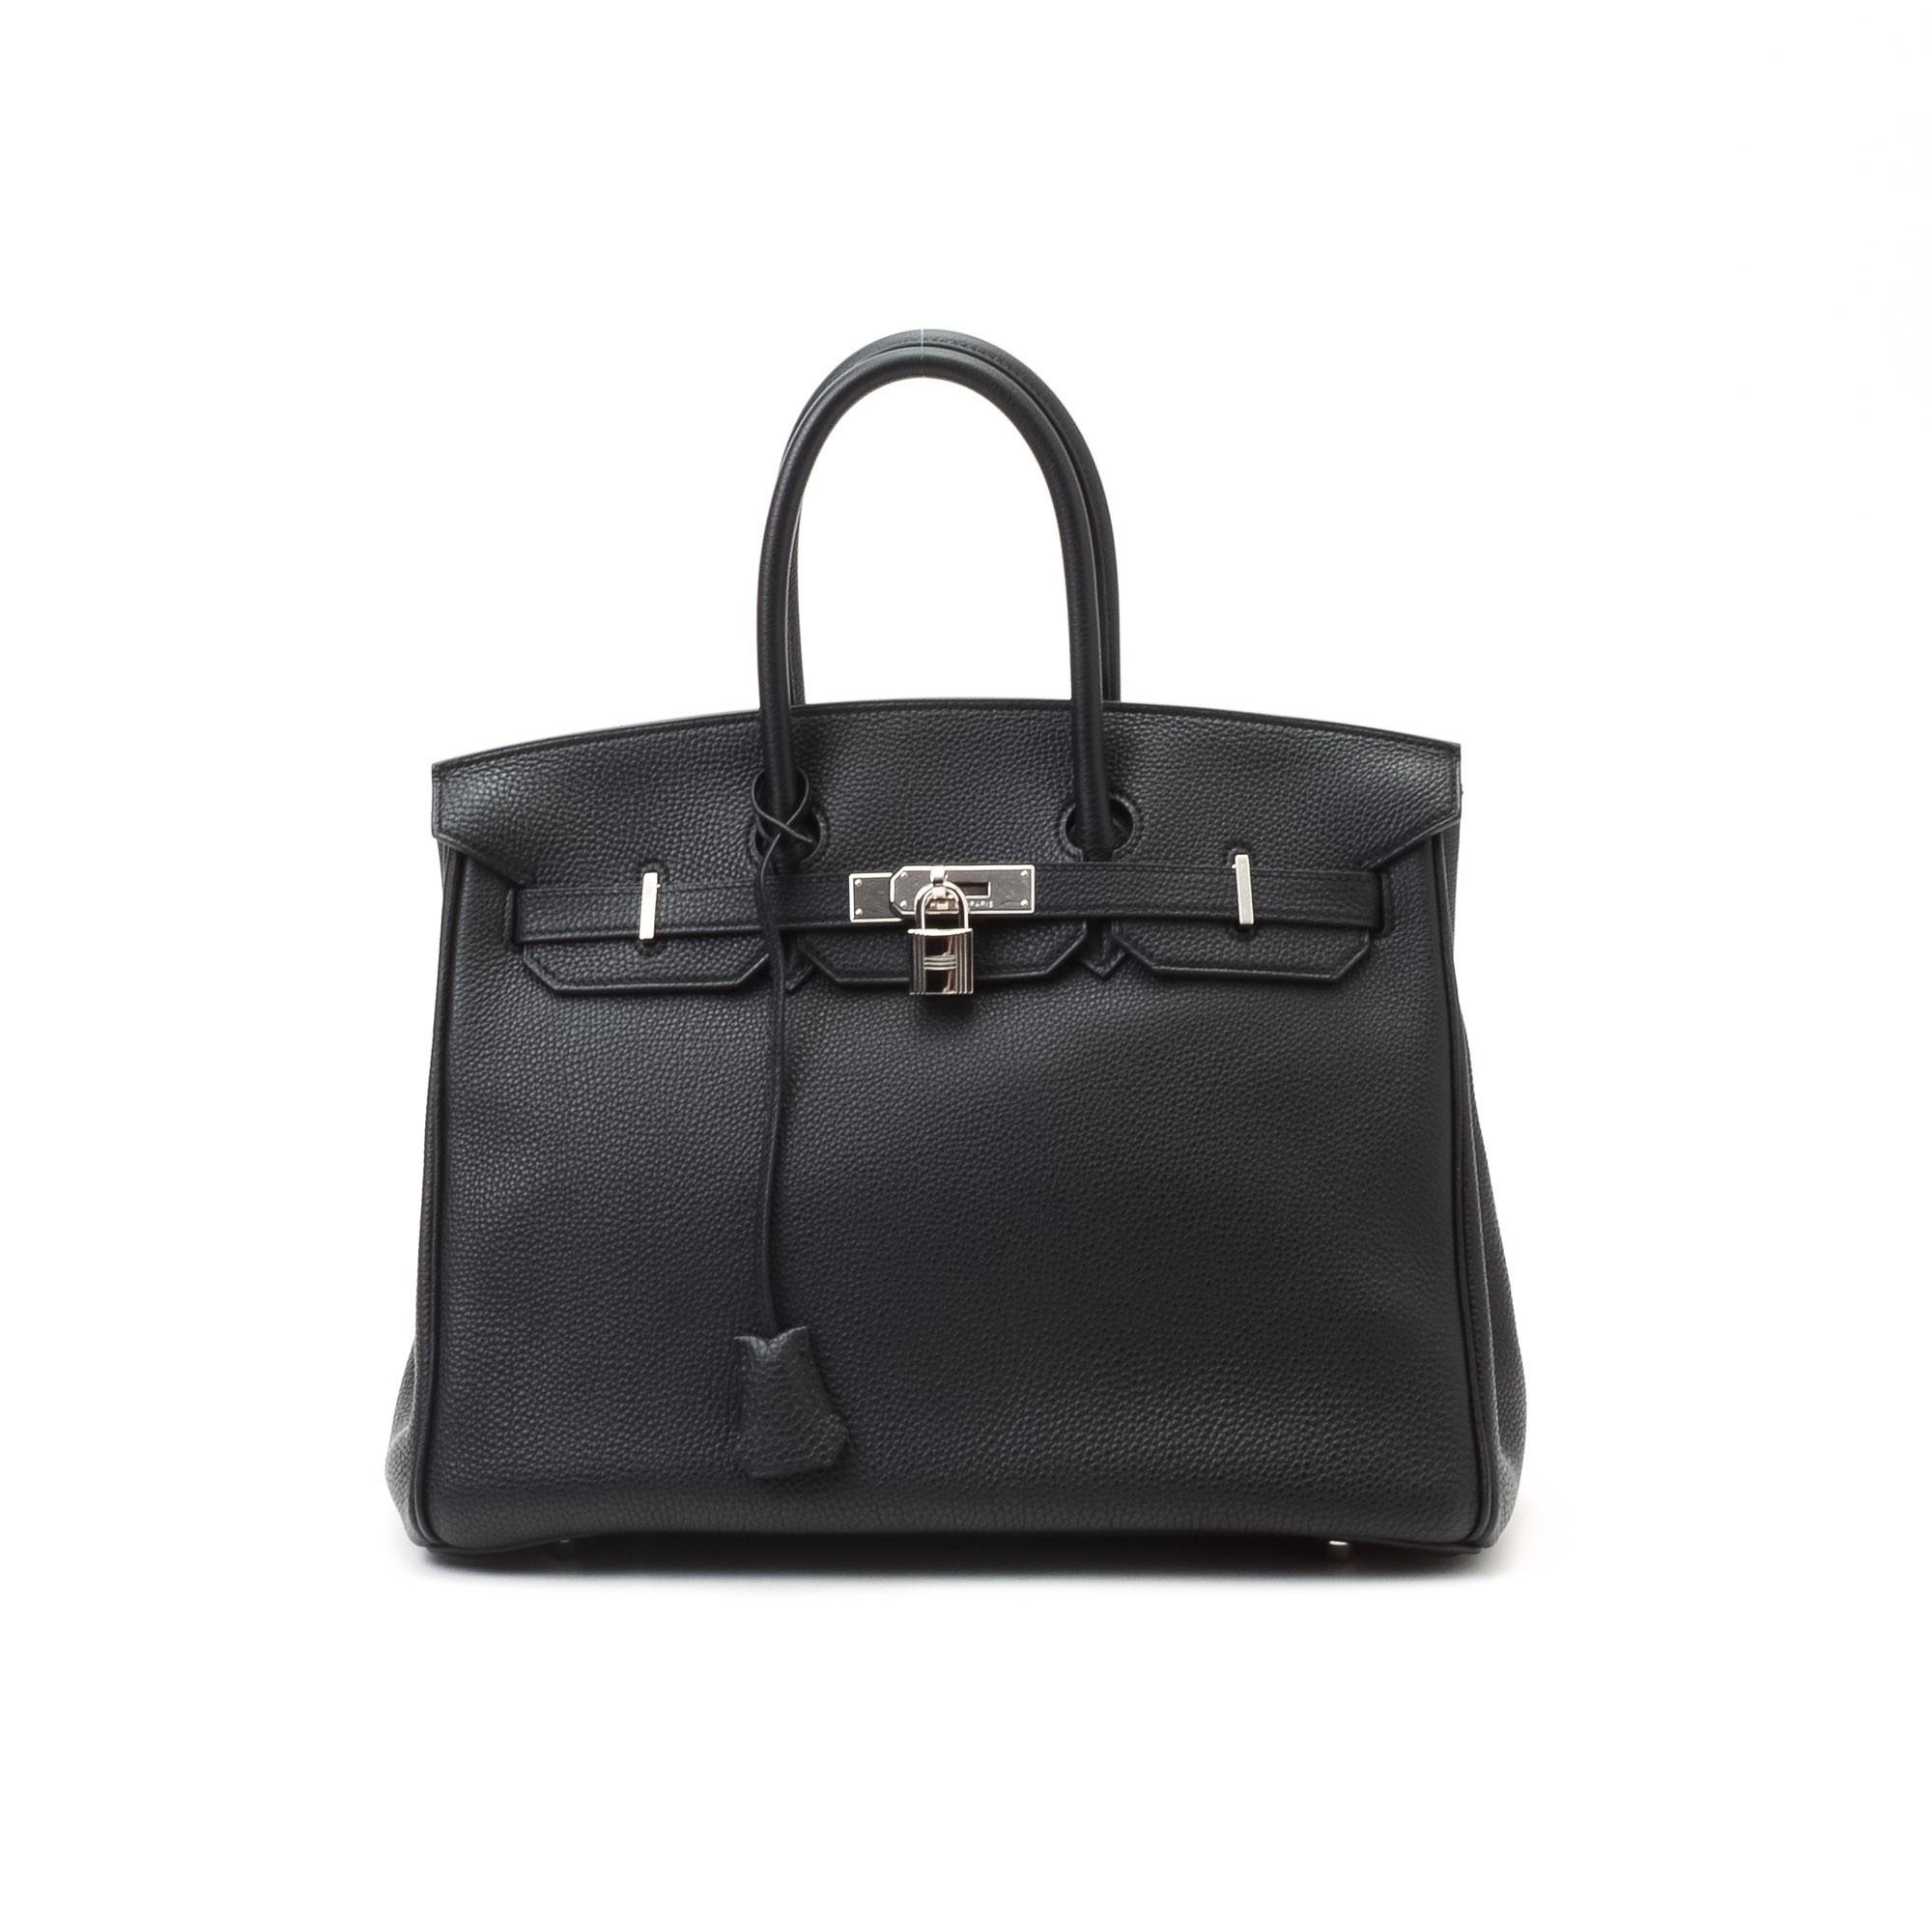 birken purses - Herm��s Birkin 35 Togo Black Calf Leather Handbag - LXR\u0026amp;CO Vintage ...